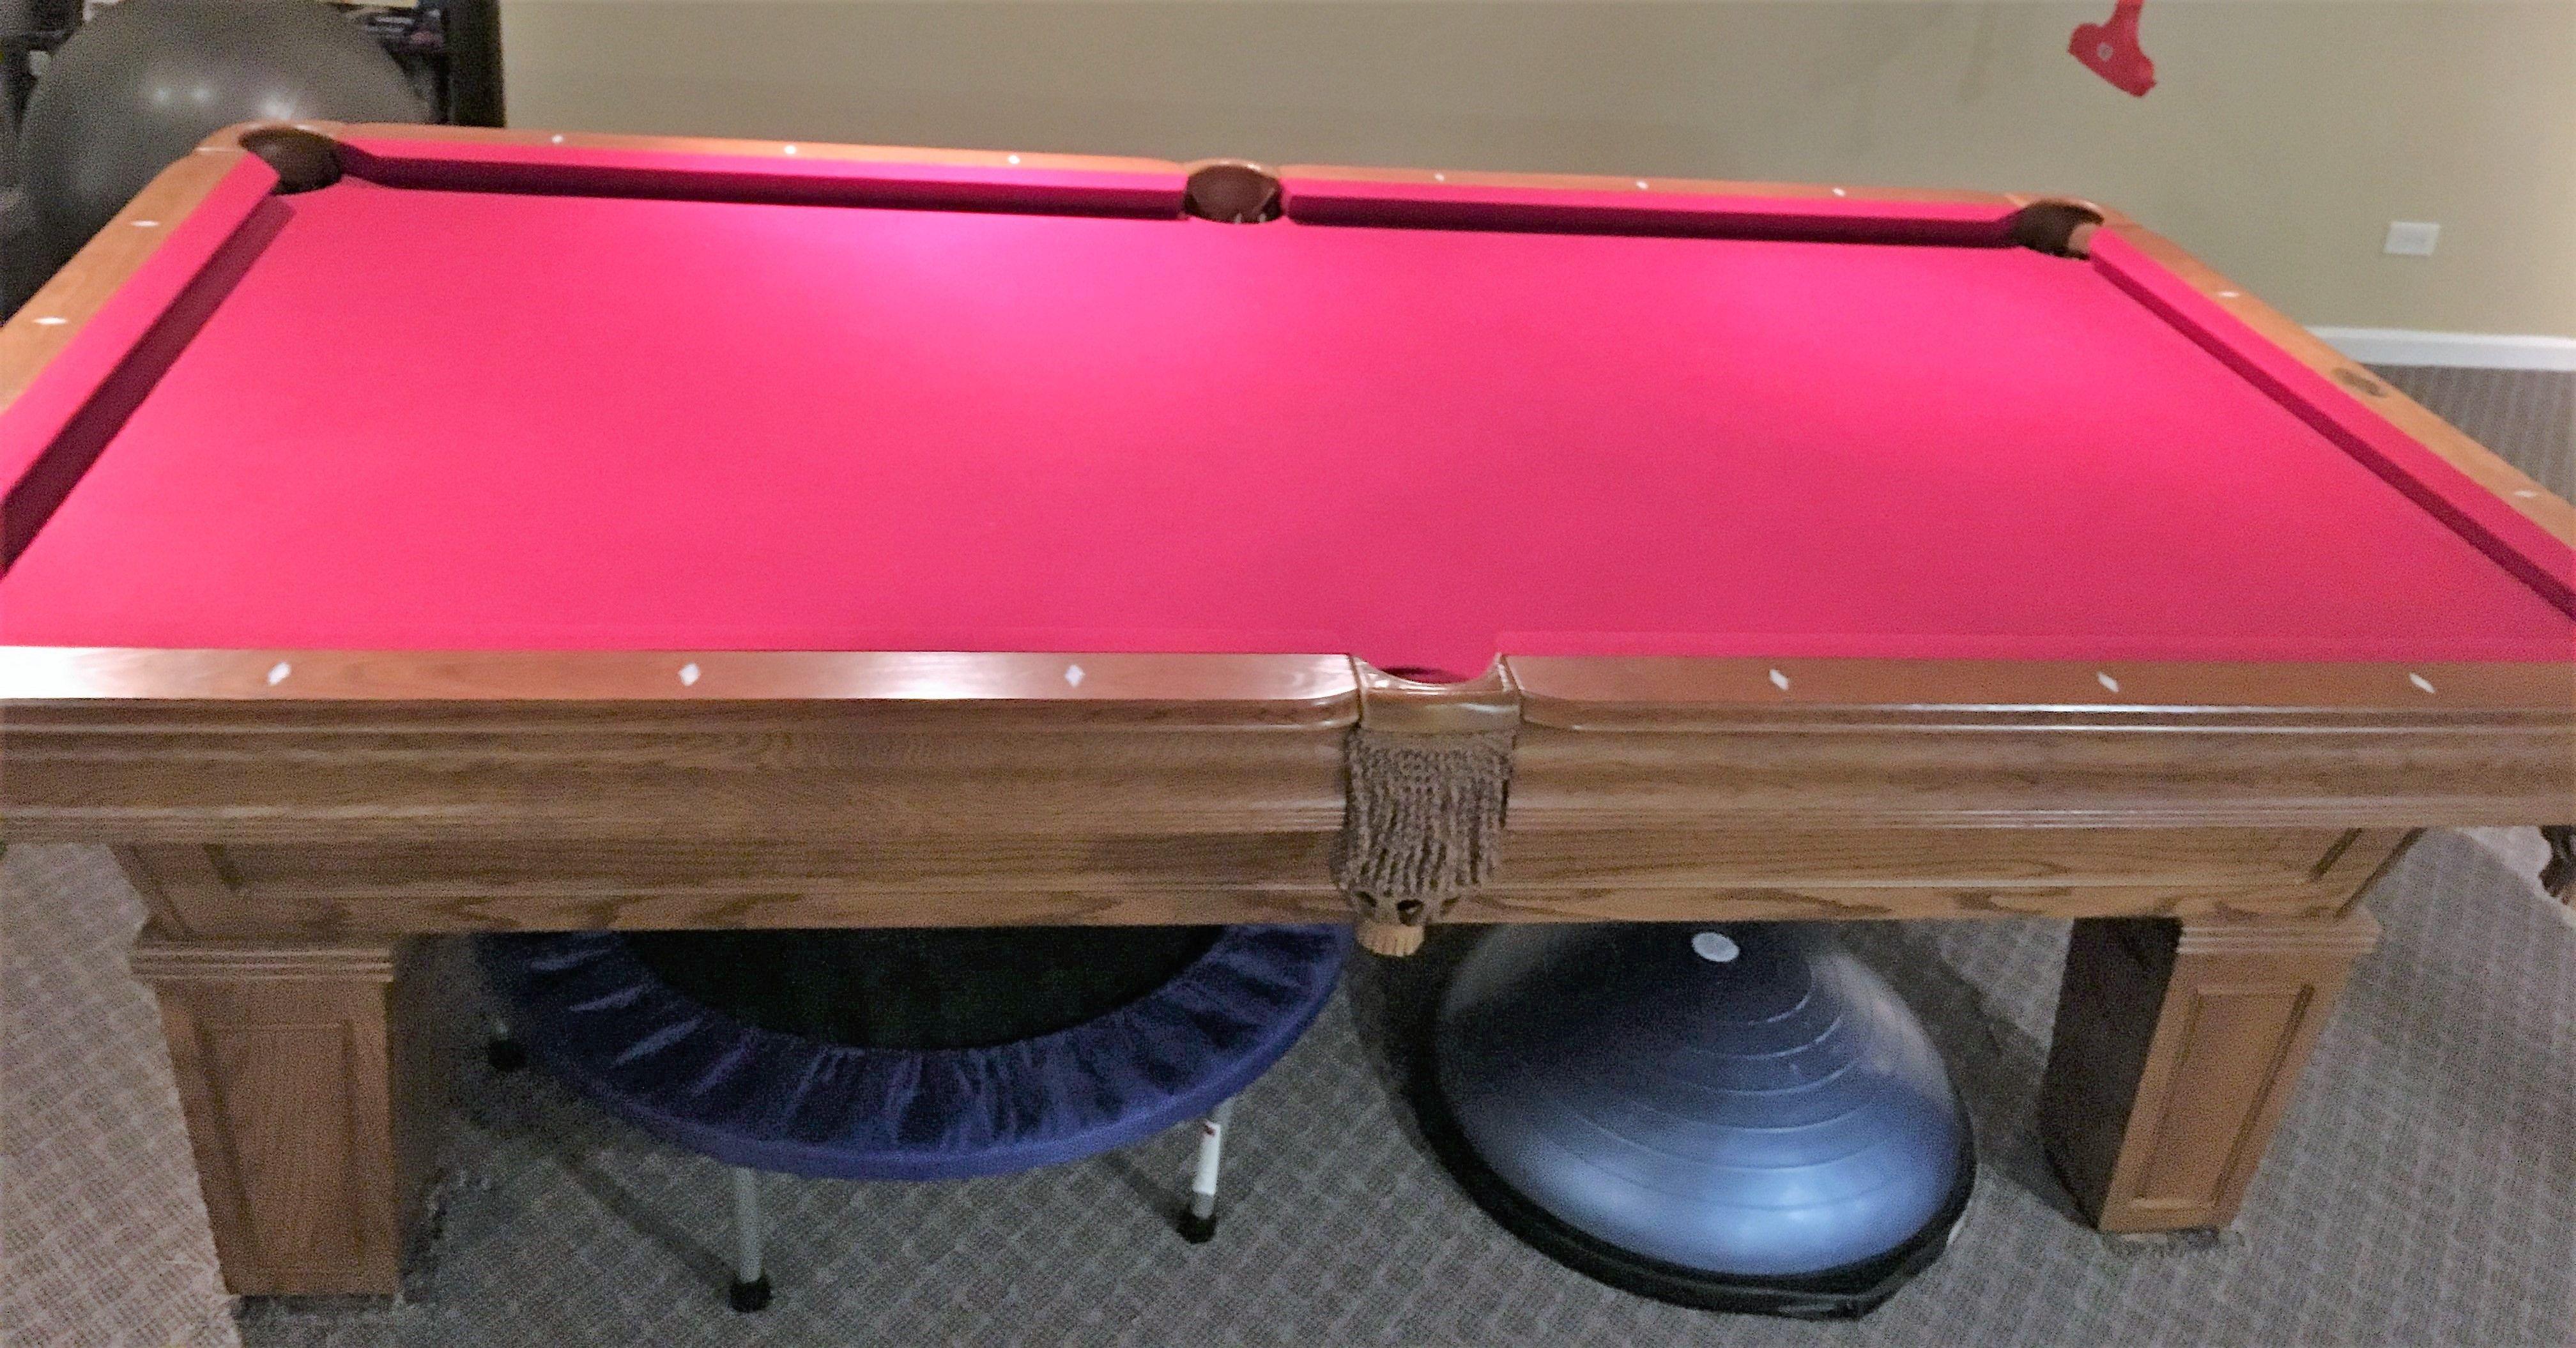 Winners Choice Sold Used Pool Tables Billiard Tables Over Time - Winners choice pool table